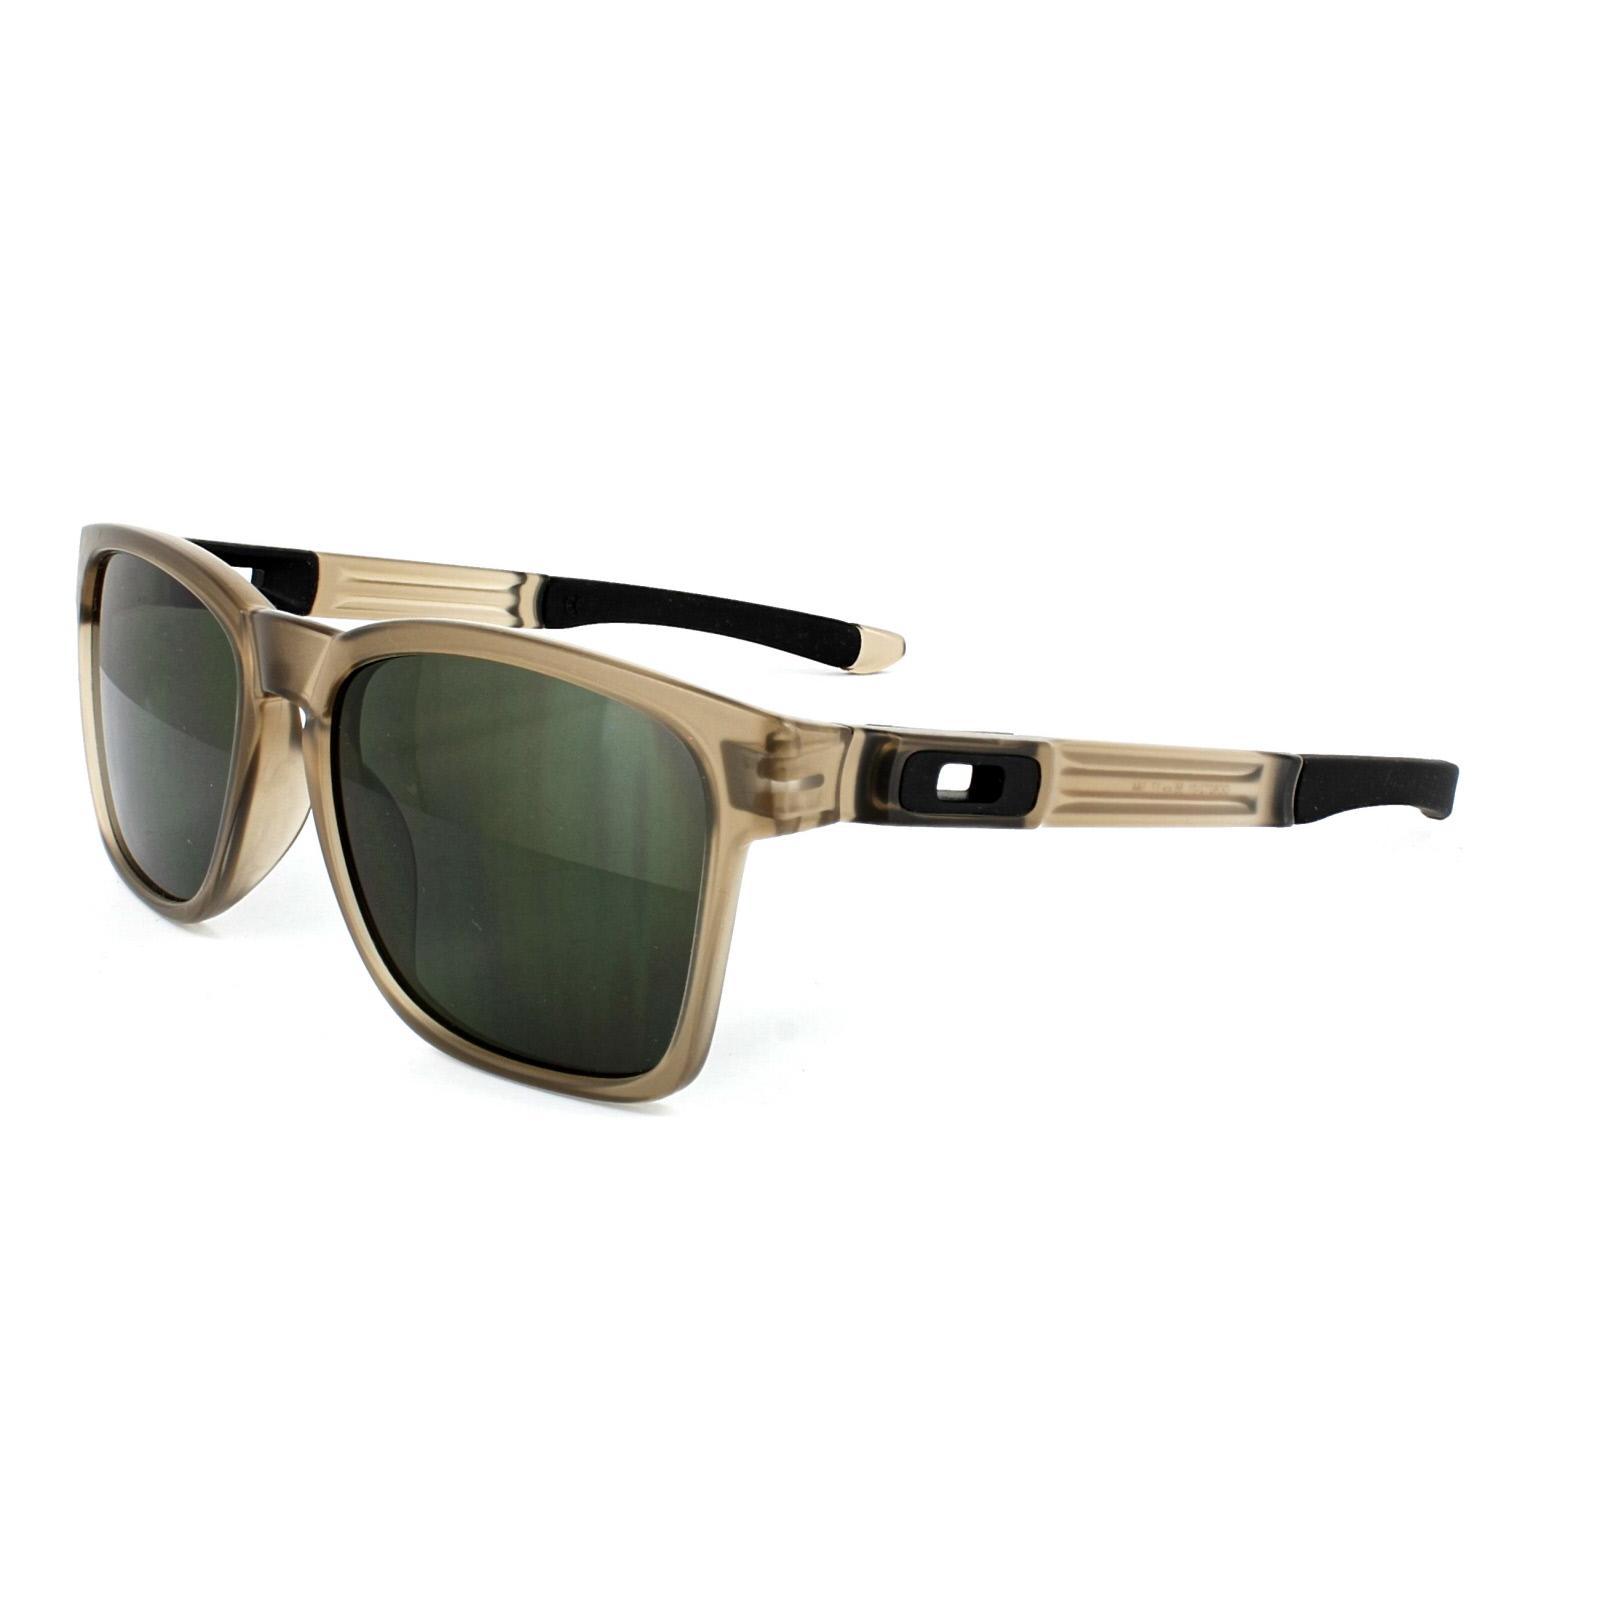 Oakley Sunglasses Catalyst OO9272-01 Sepia Dark Grey 888392097712   eBay 50466b2dec